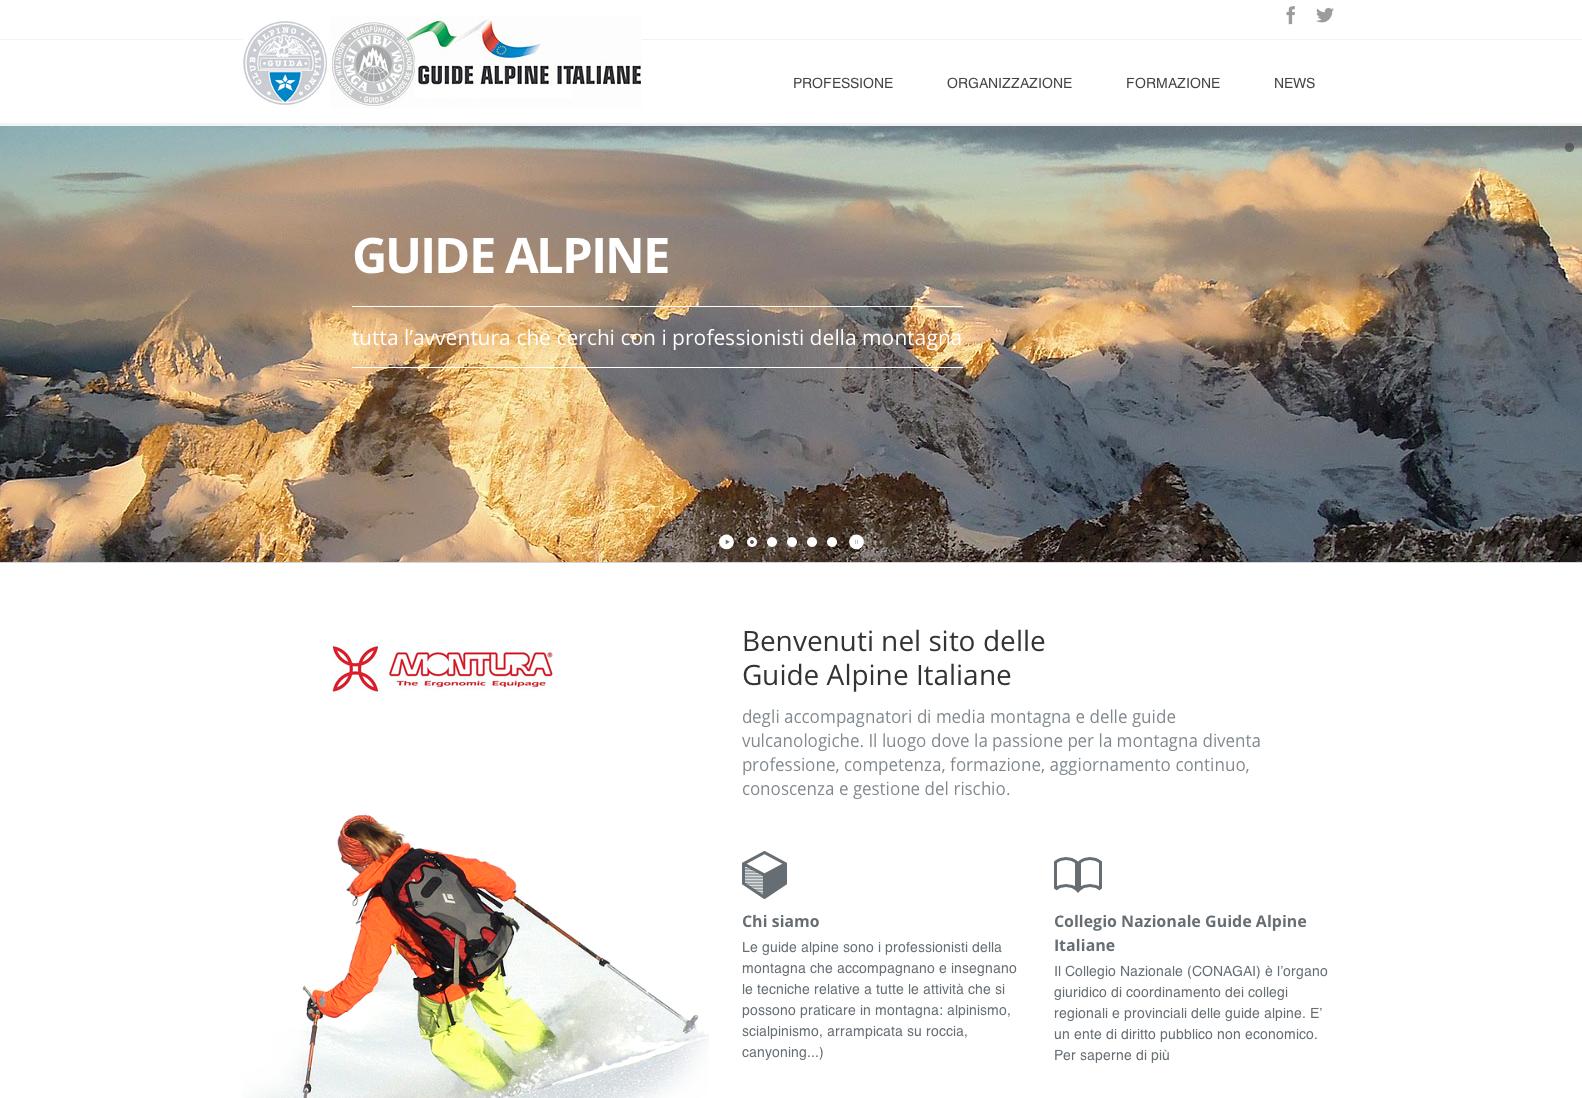 GuideAlpineitaliane_sito